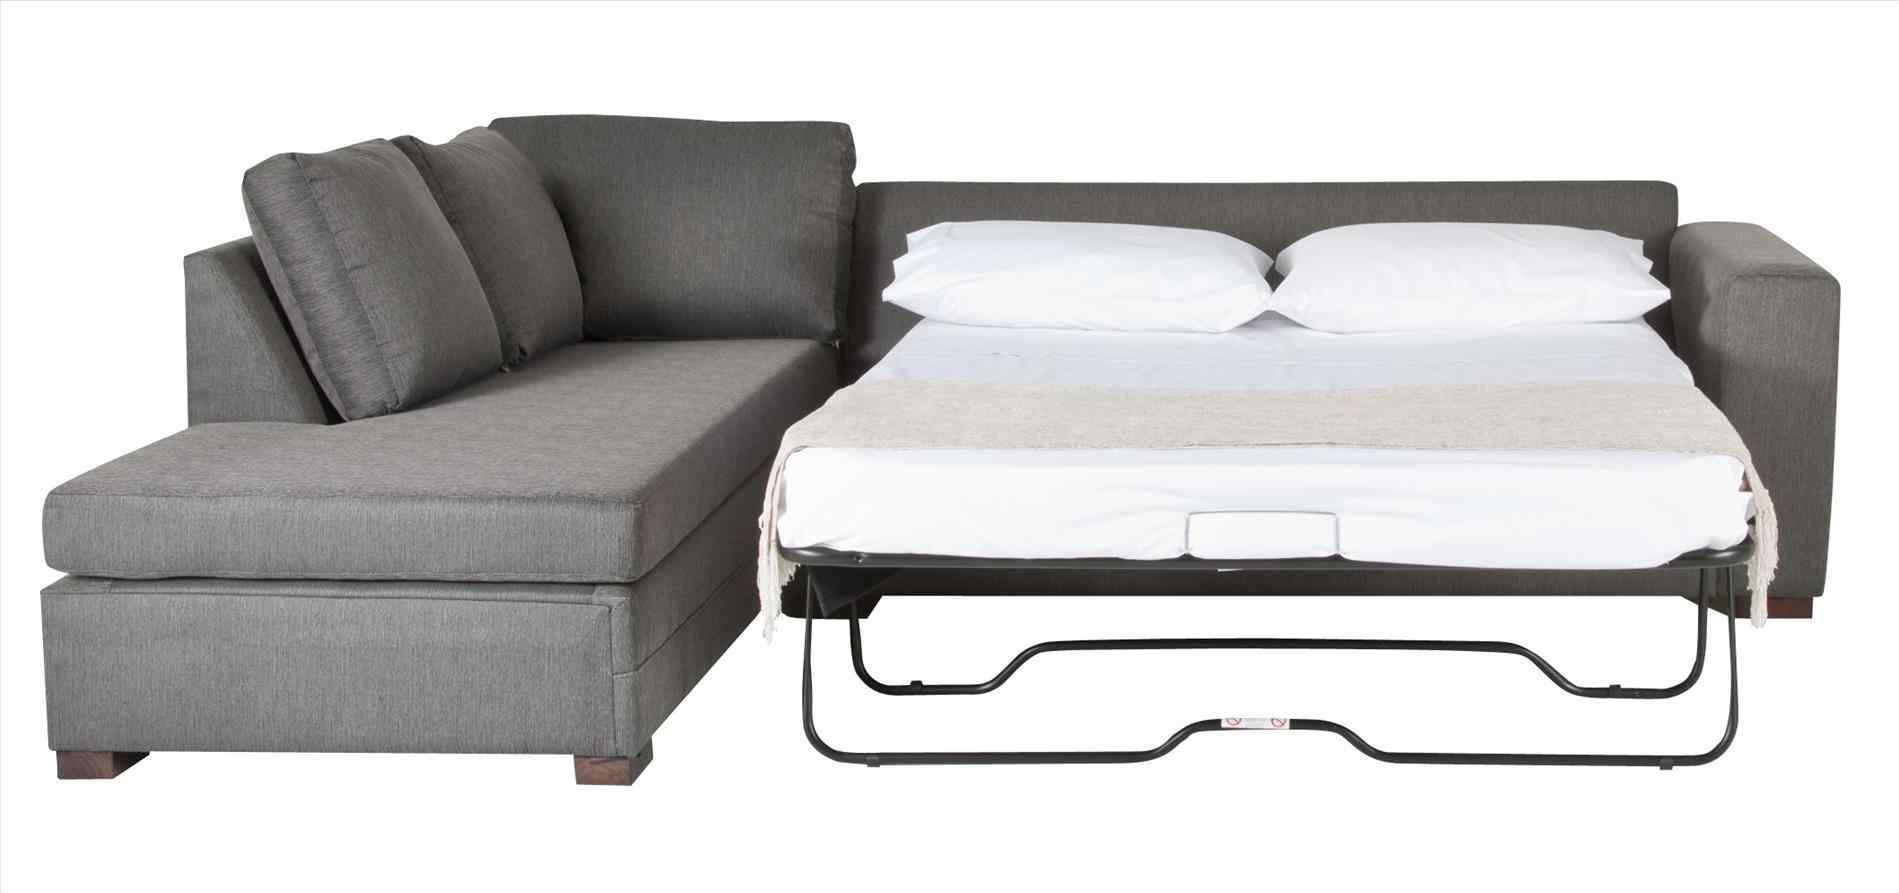 Twin Best Decoration Rooms Au Furniture Sleeper Sofa To Go Moran Novogratz Vintage Tufted